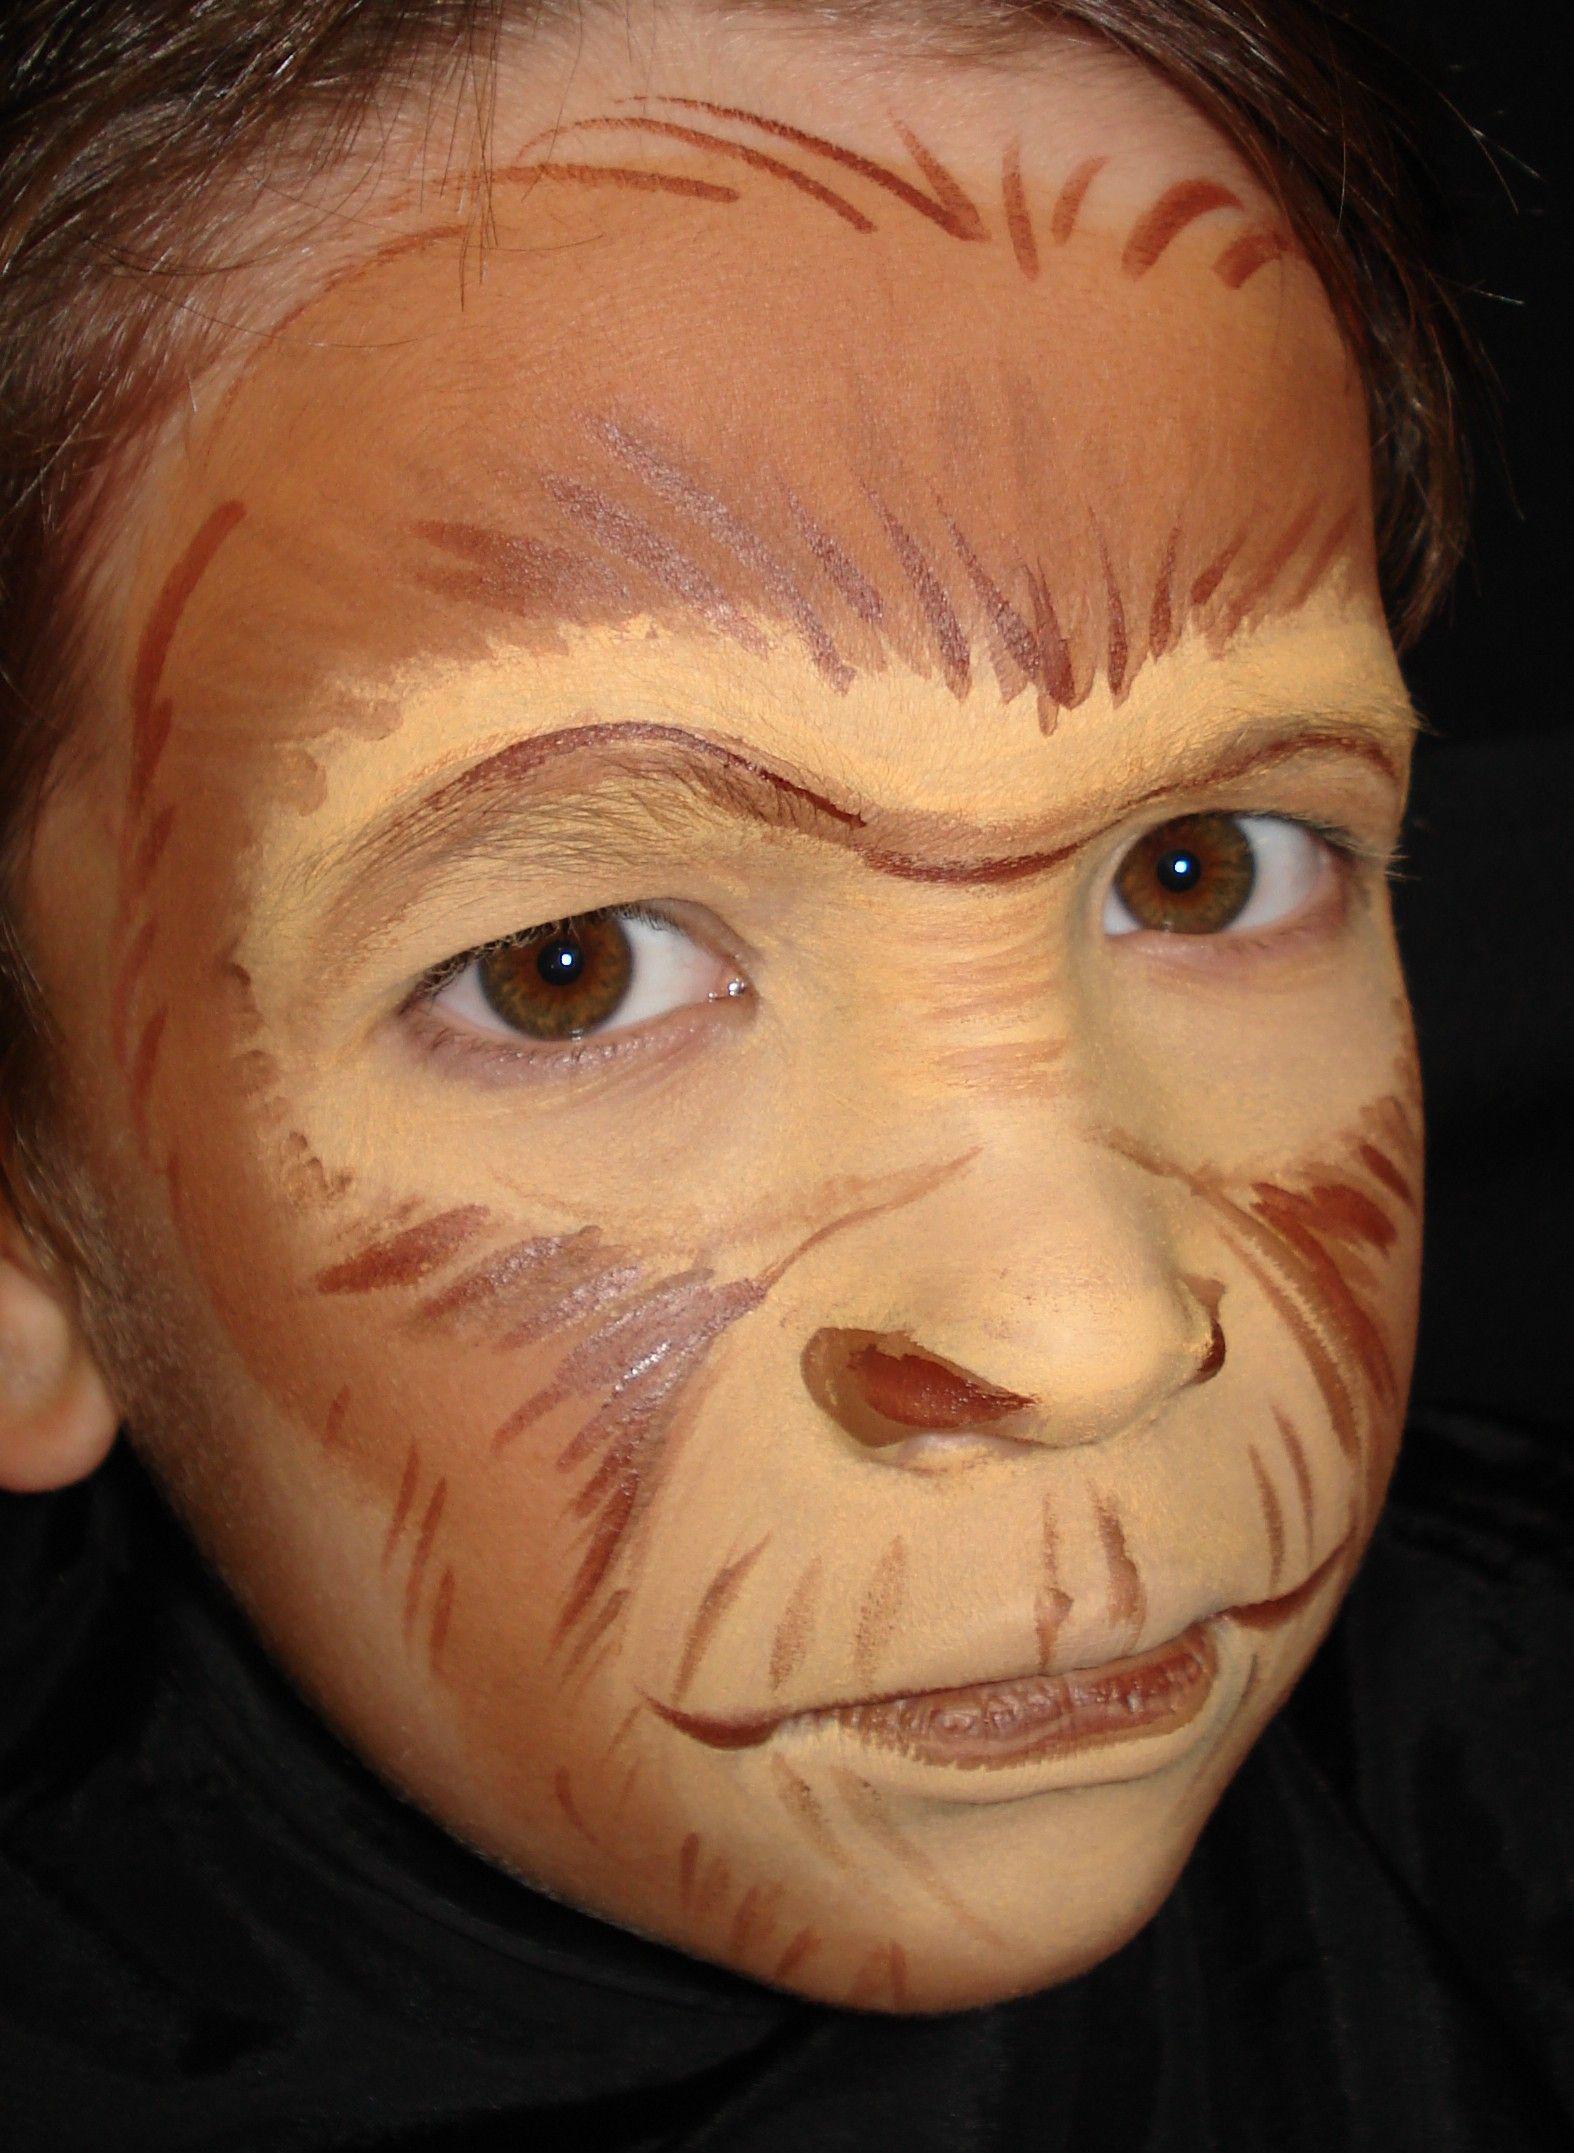 Monkeys | face painting | Pinterest | Monkey face paint ...